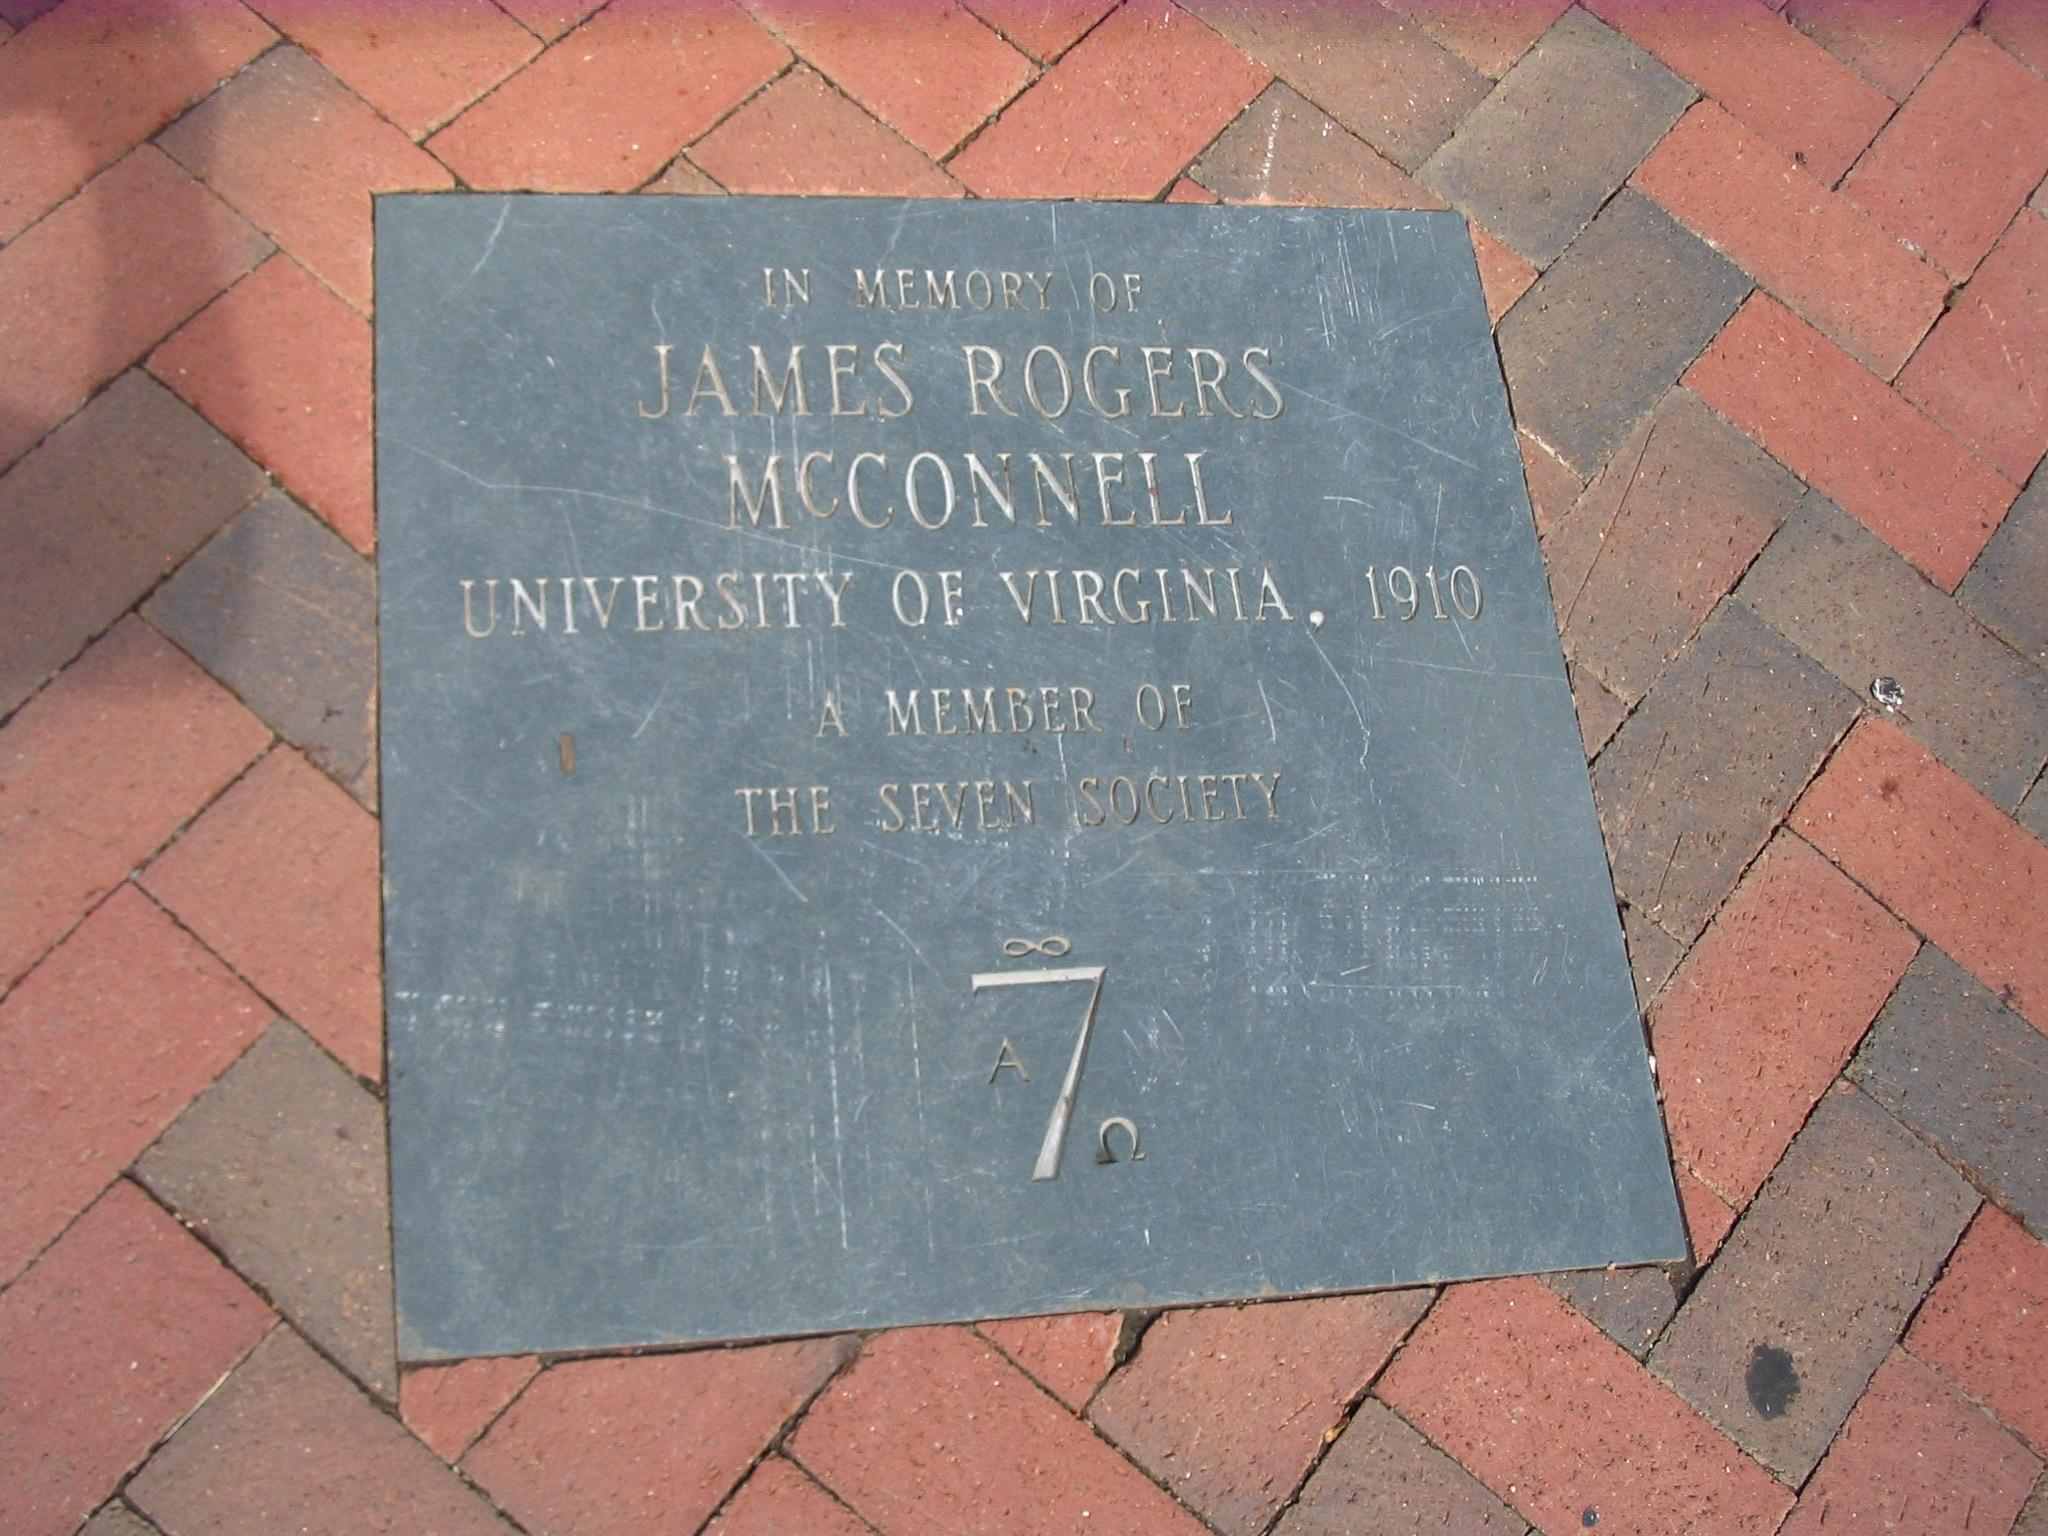 File:SEVEN SOCIETY plaque JPG - Wikimedia Commons